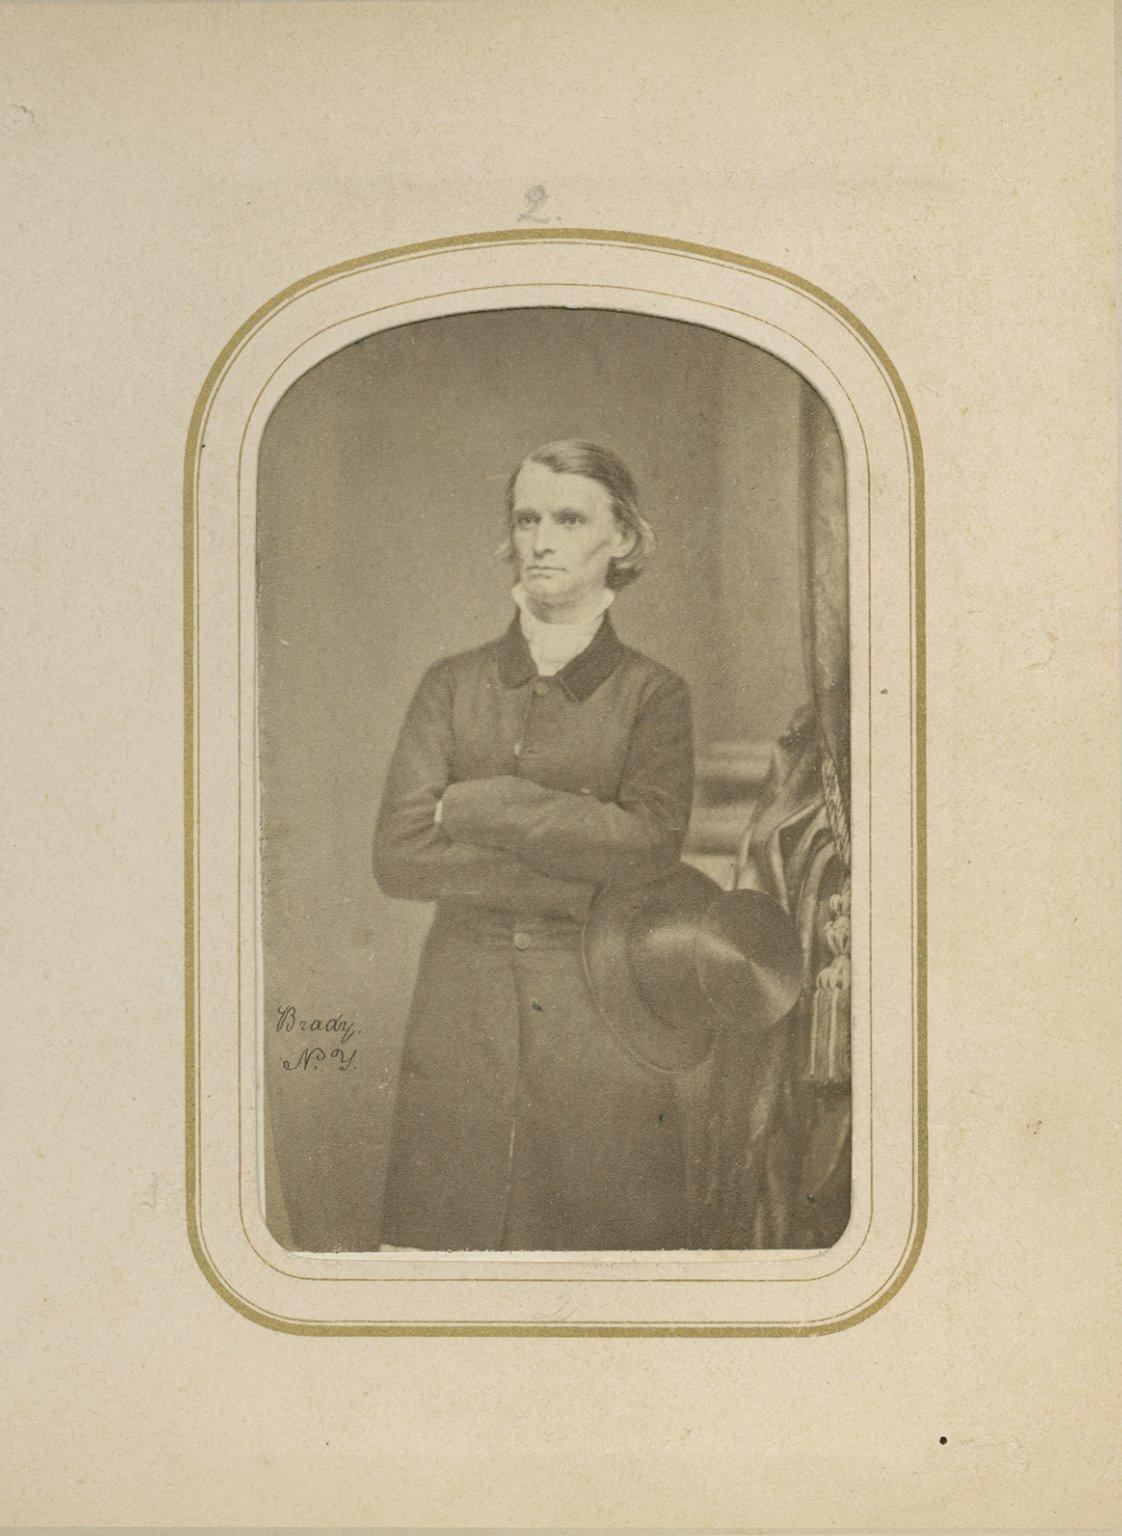 Gov. / Gen. Henry A. Wise